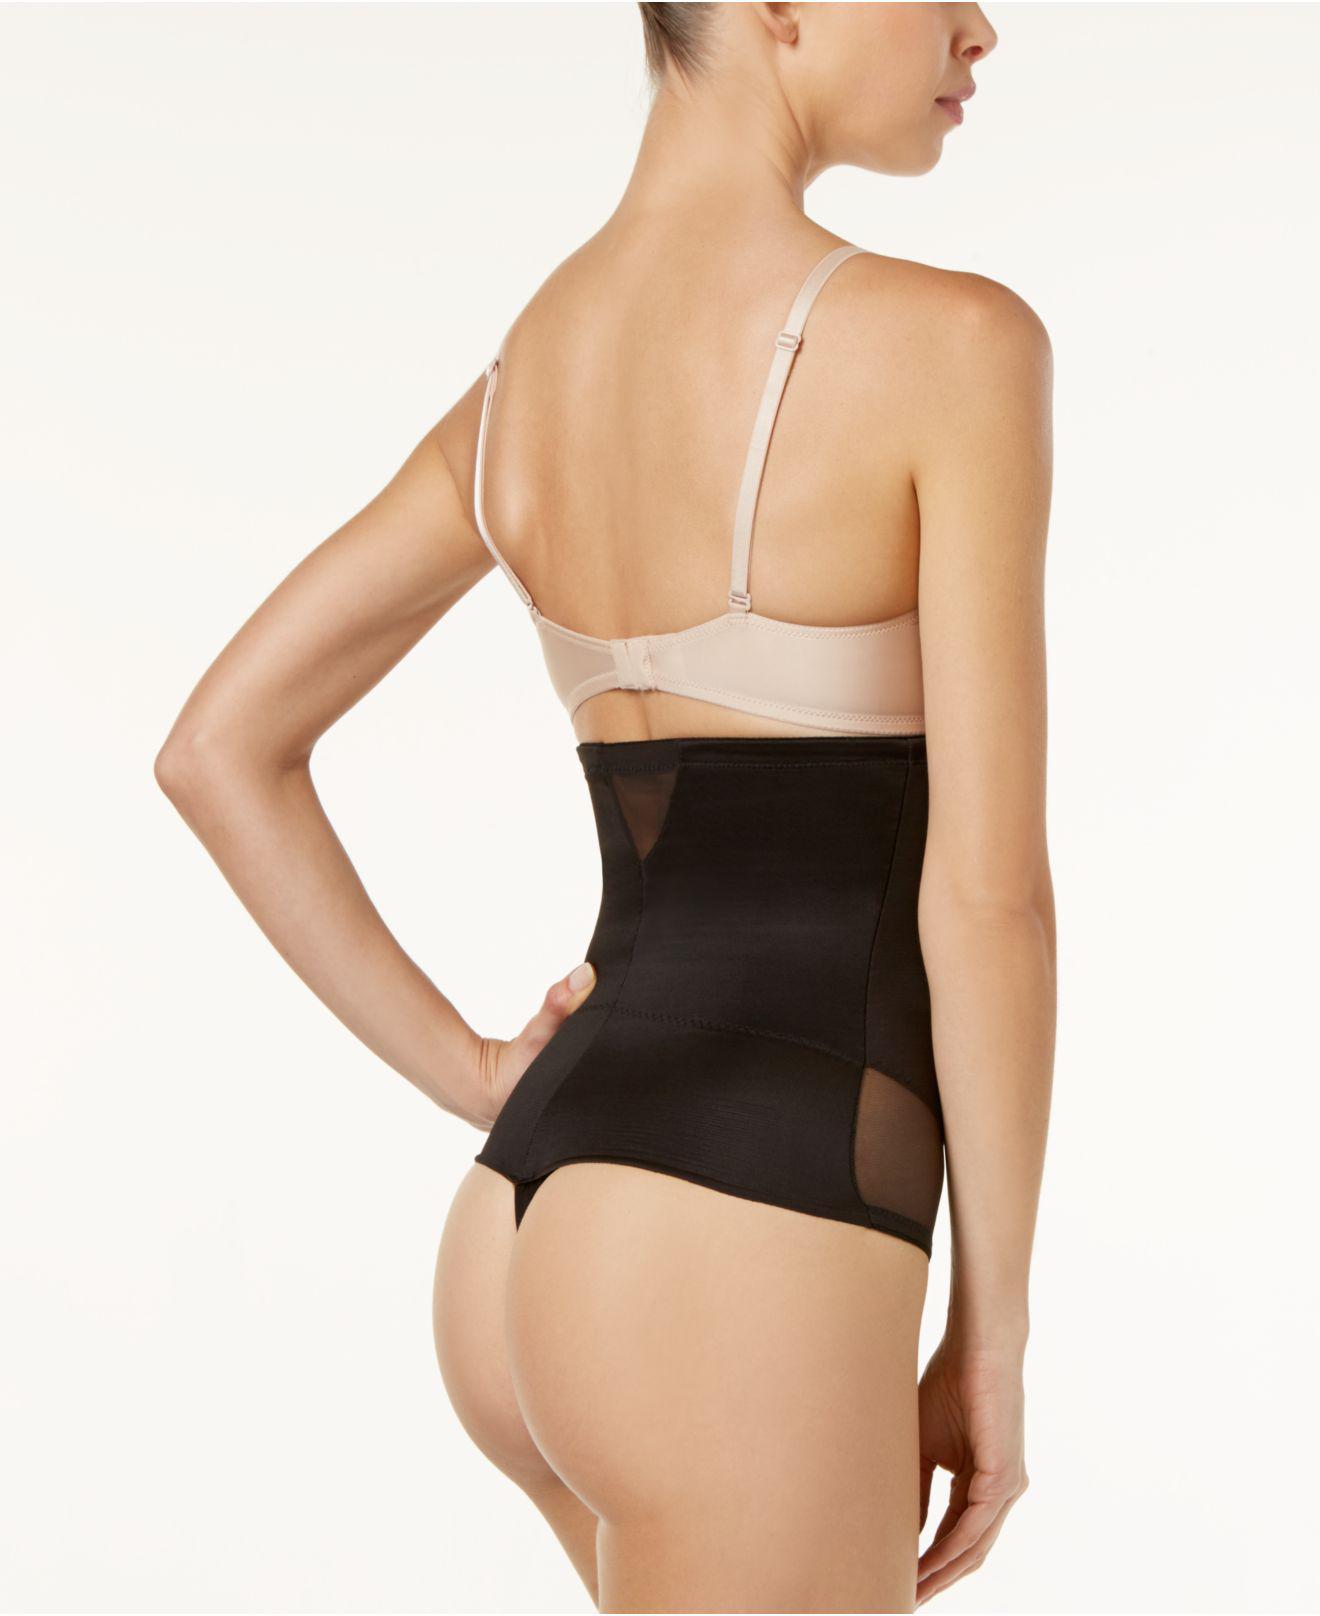 5fb65bfbbe5b2 Miraclesuit - Black Extra Firm Control High-waist Sheer Thong 2778 - Lyst.  View fullscreen